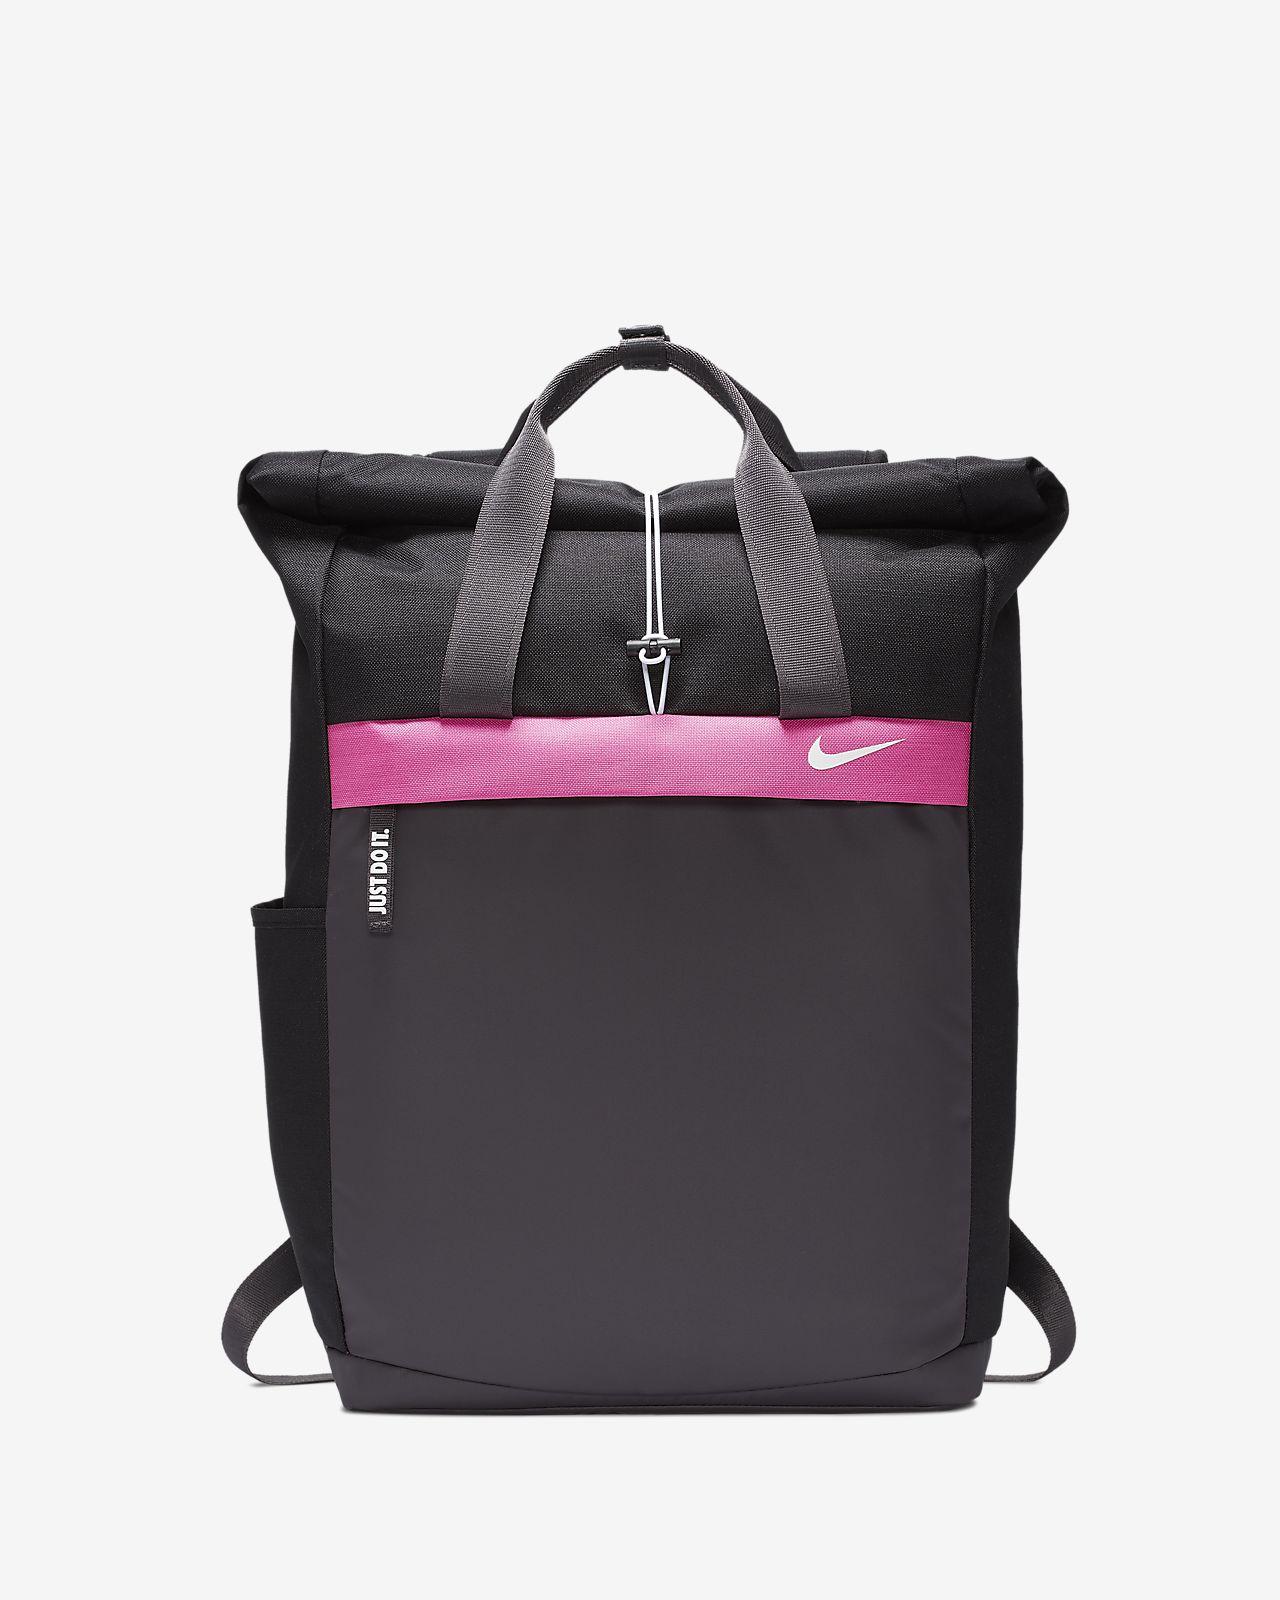 664221168e01 Low Resolution Nike Radiate hátizsák Nike Radiate hátizsák